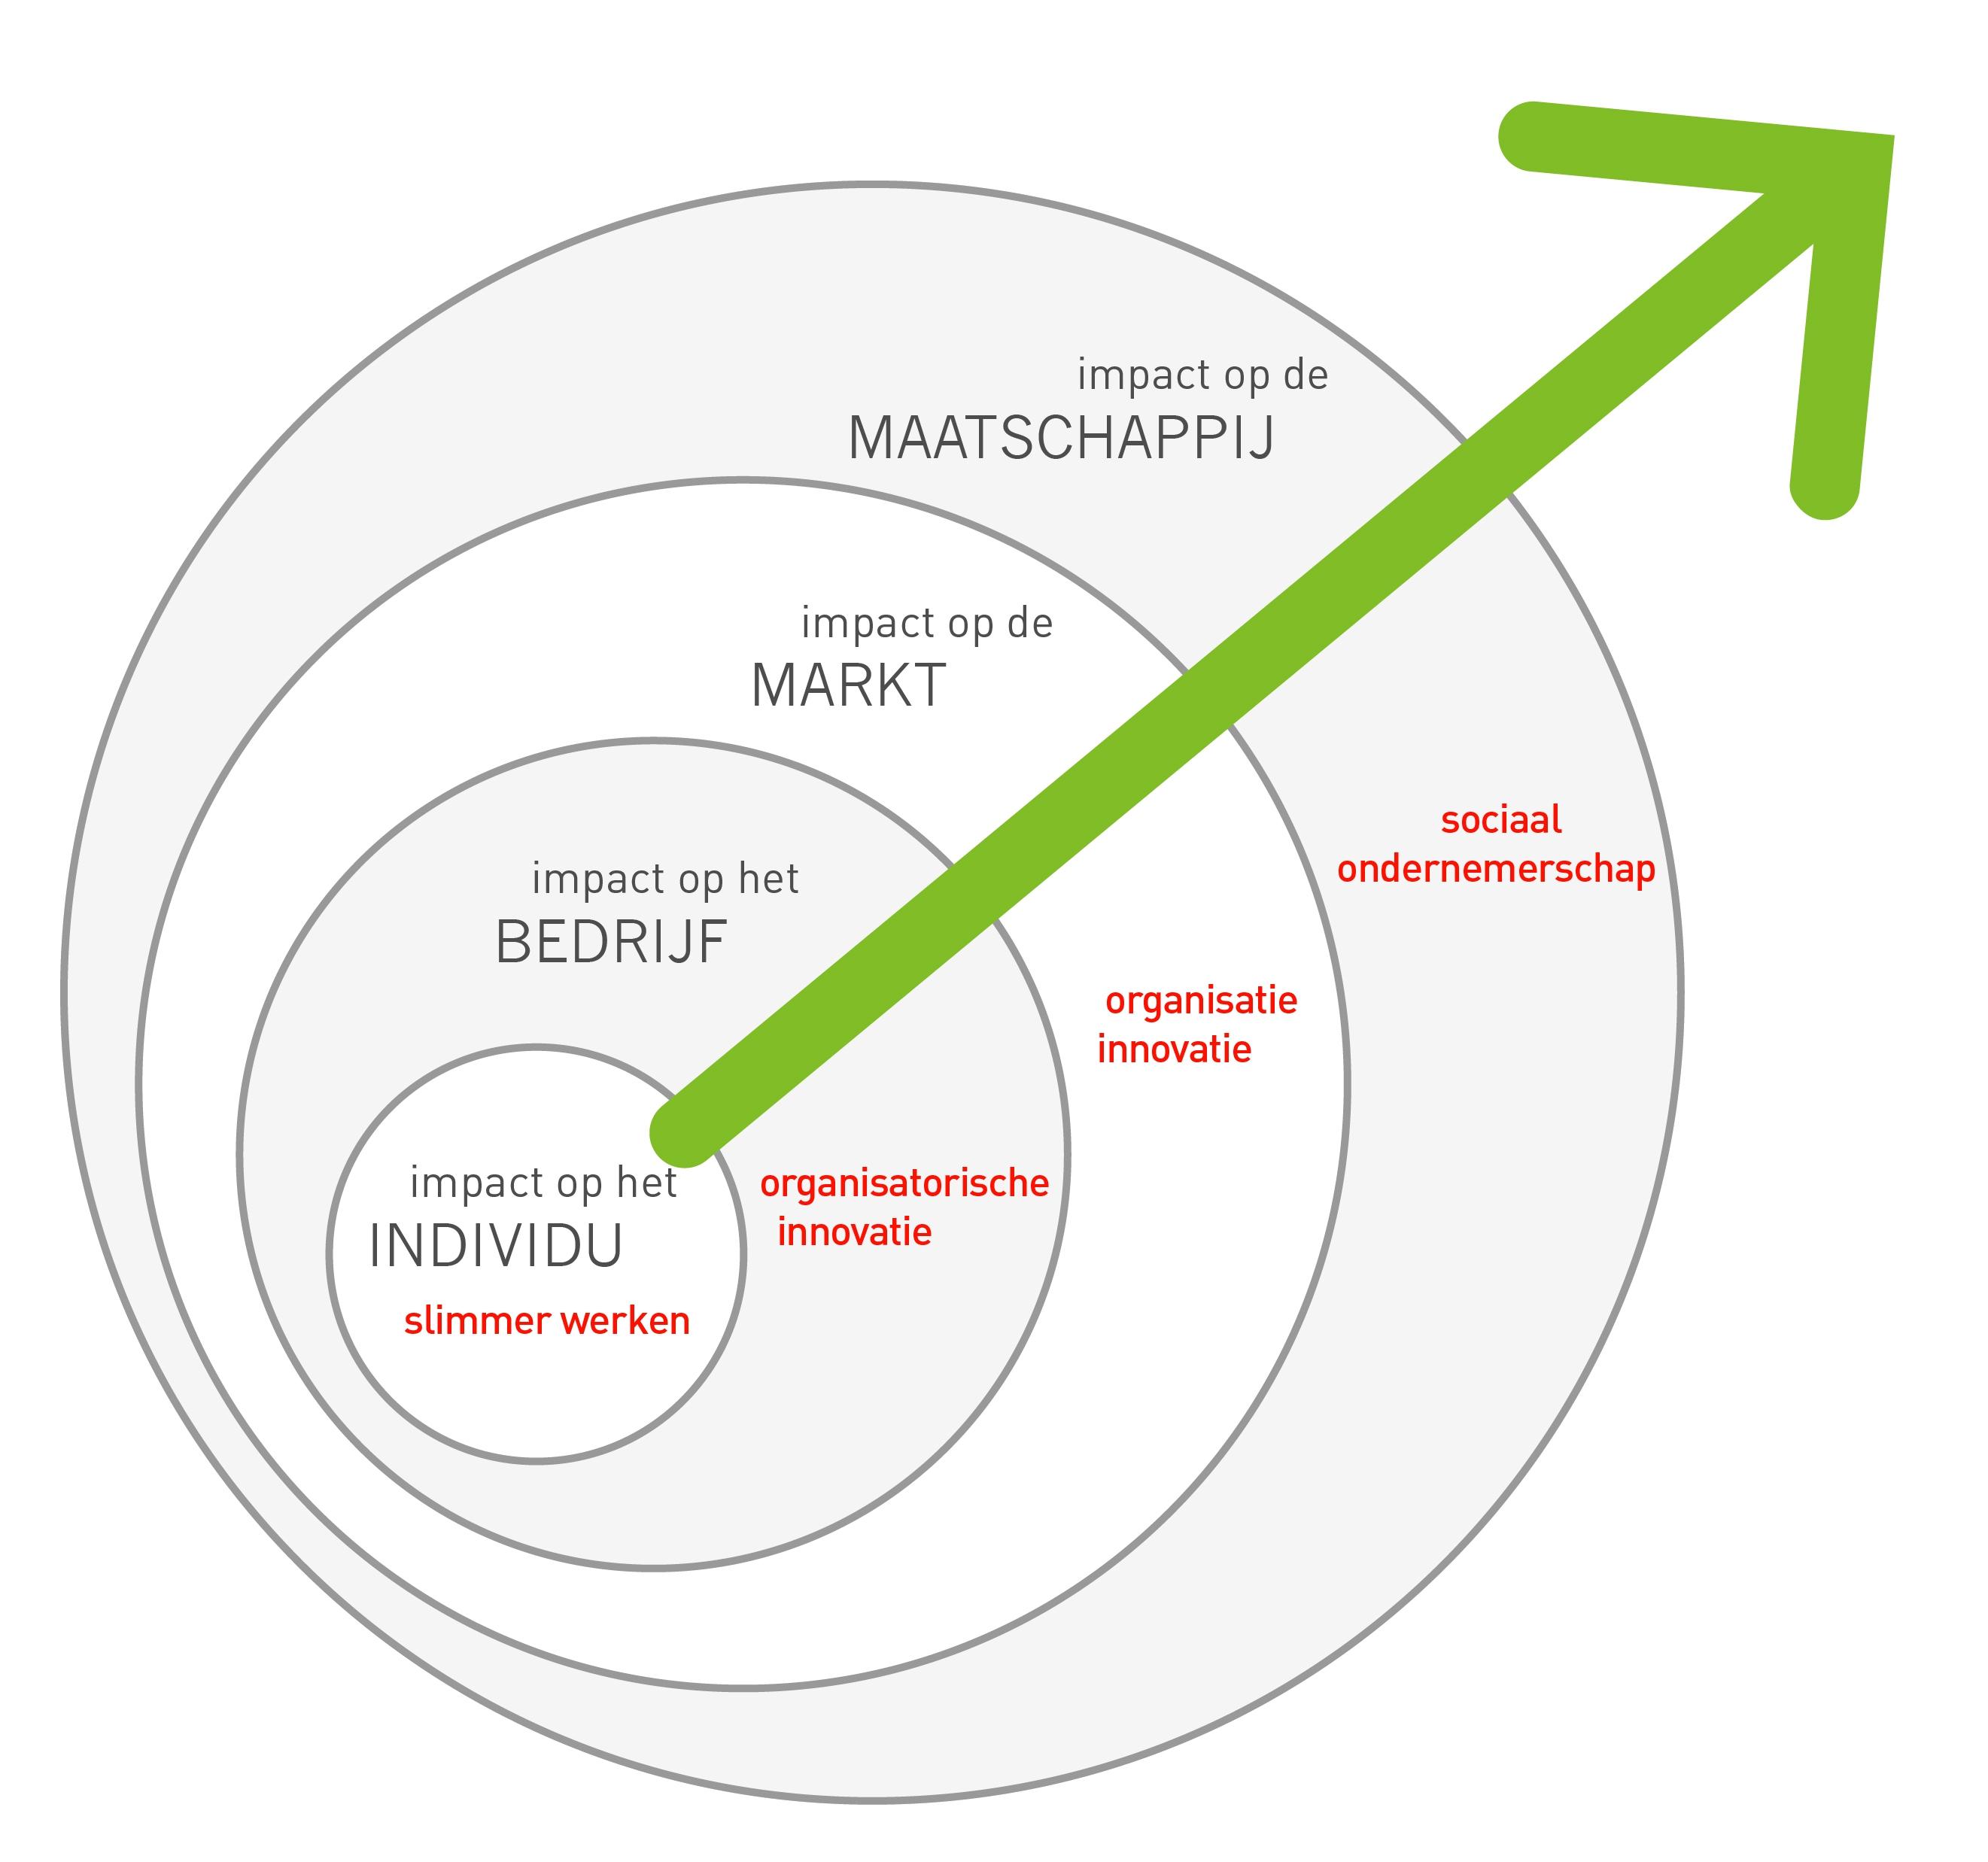 Mkb krachtcentrale groeimodel illustratiegroeimodel illustratie mkb krachtcentrale - Ontwikkeling m ...